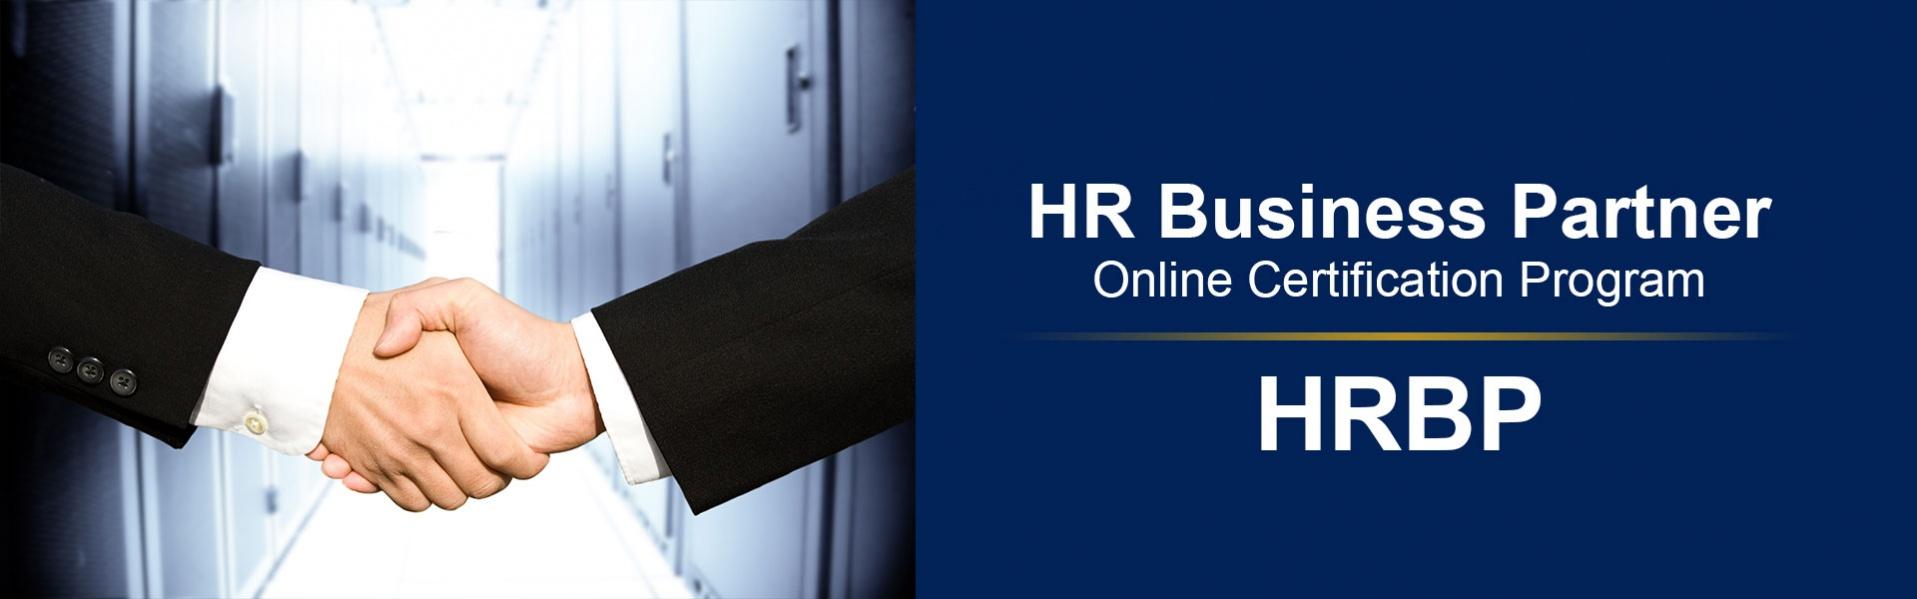 HRBP Online Certification Program